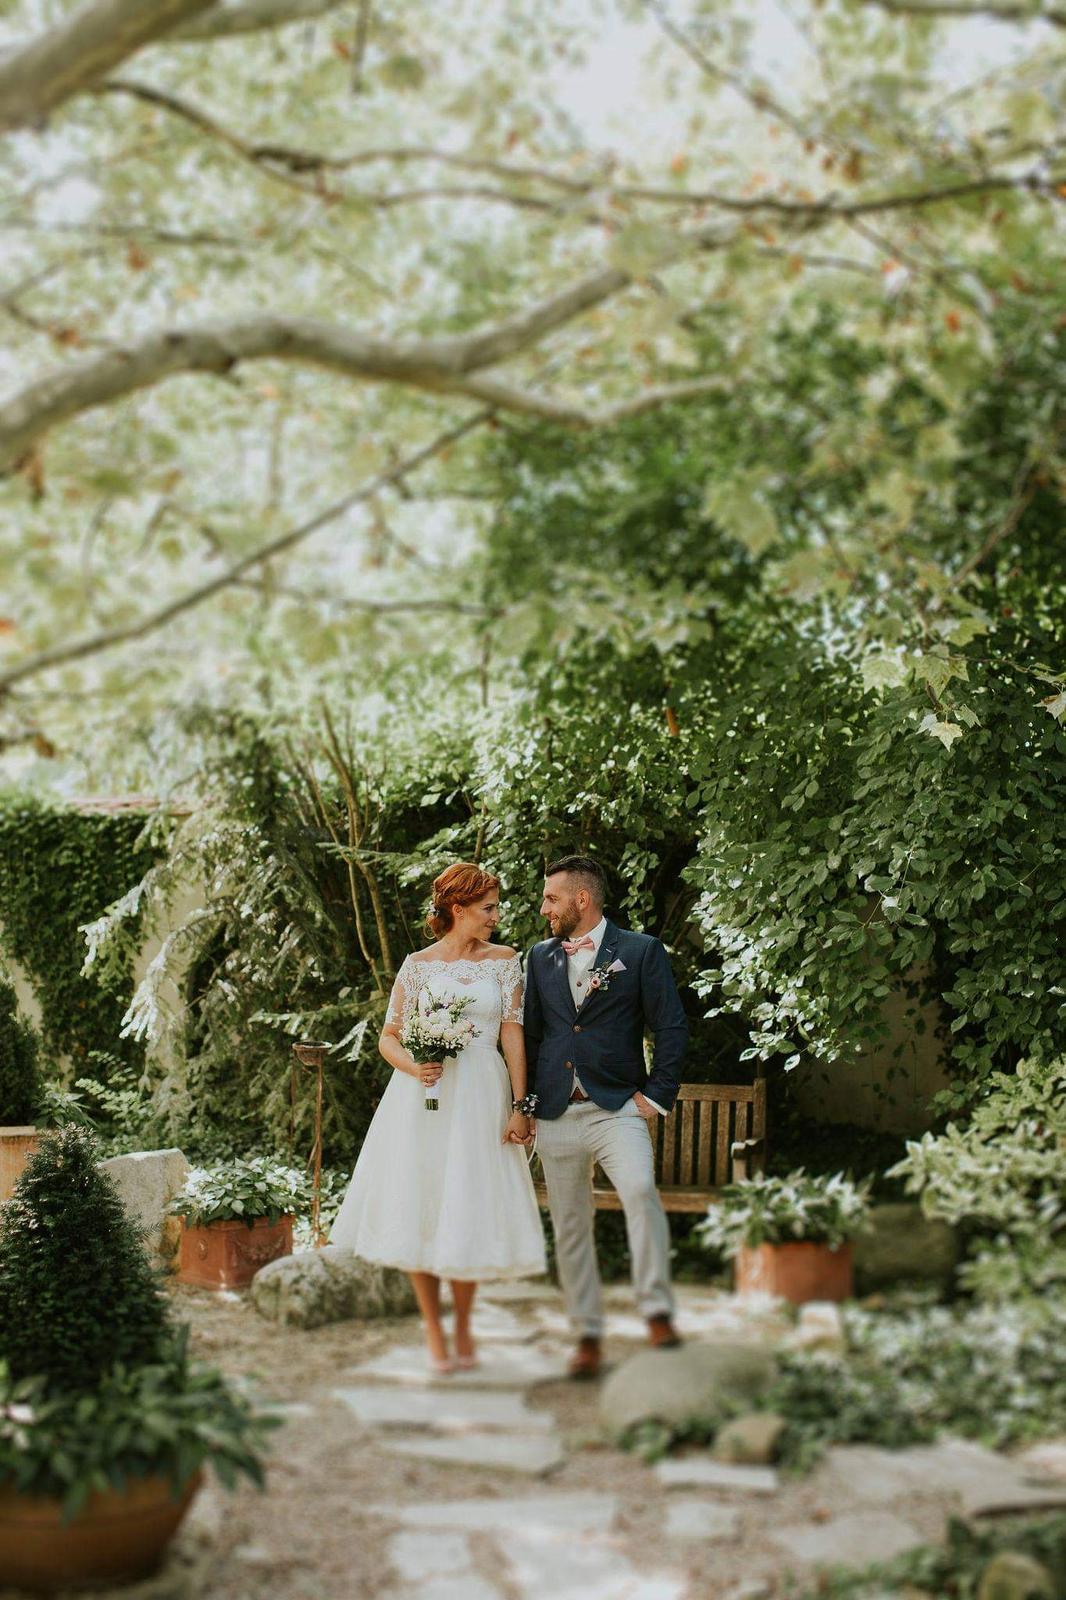 Janka & Ivan a ich svadobný outfit ❤ - Obrázok č. 1